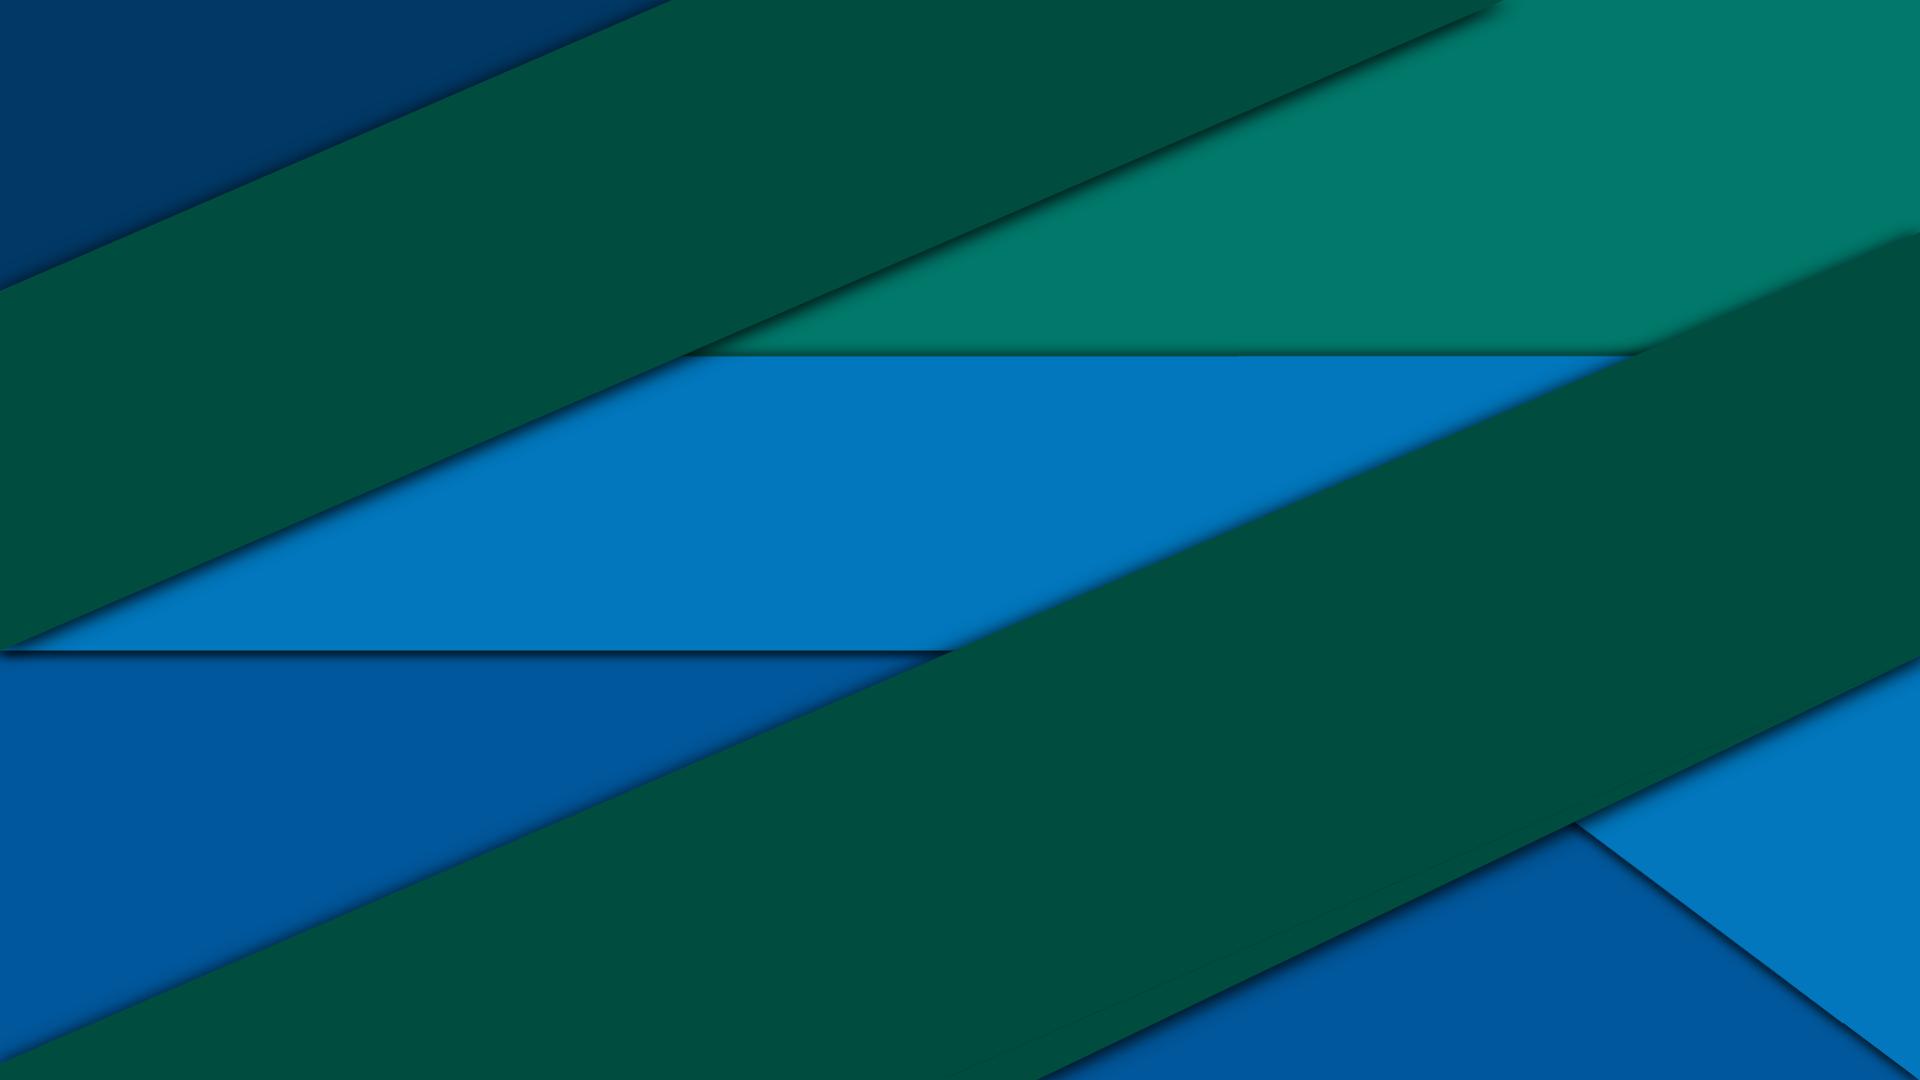 40 Best Material Design Wallpapers 4K 2016 HD Windows 7, 8